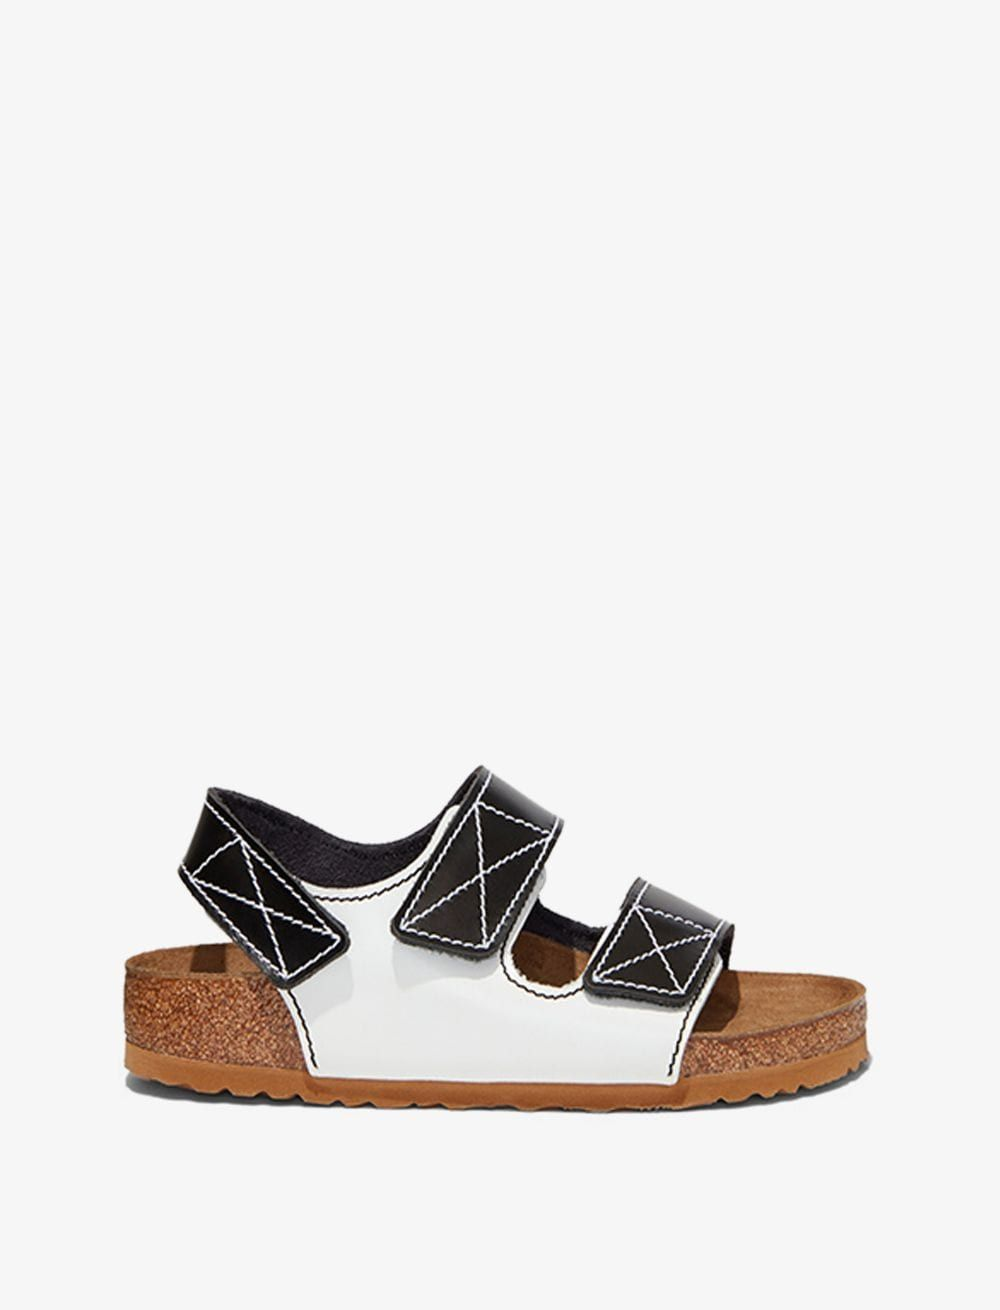 Black/White Furs & Skins->Leather Birkenstock x Proenza Schouler Milano Sandals from Proenza Schouler.